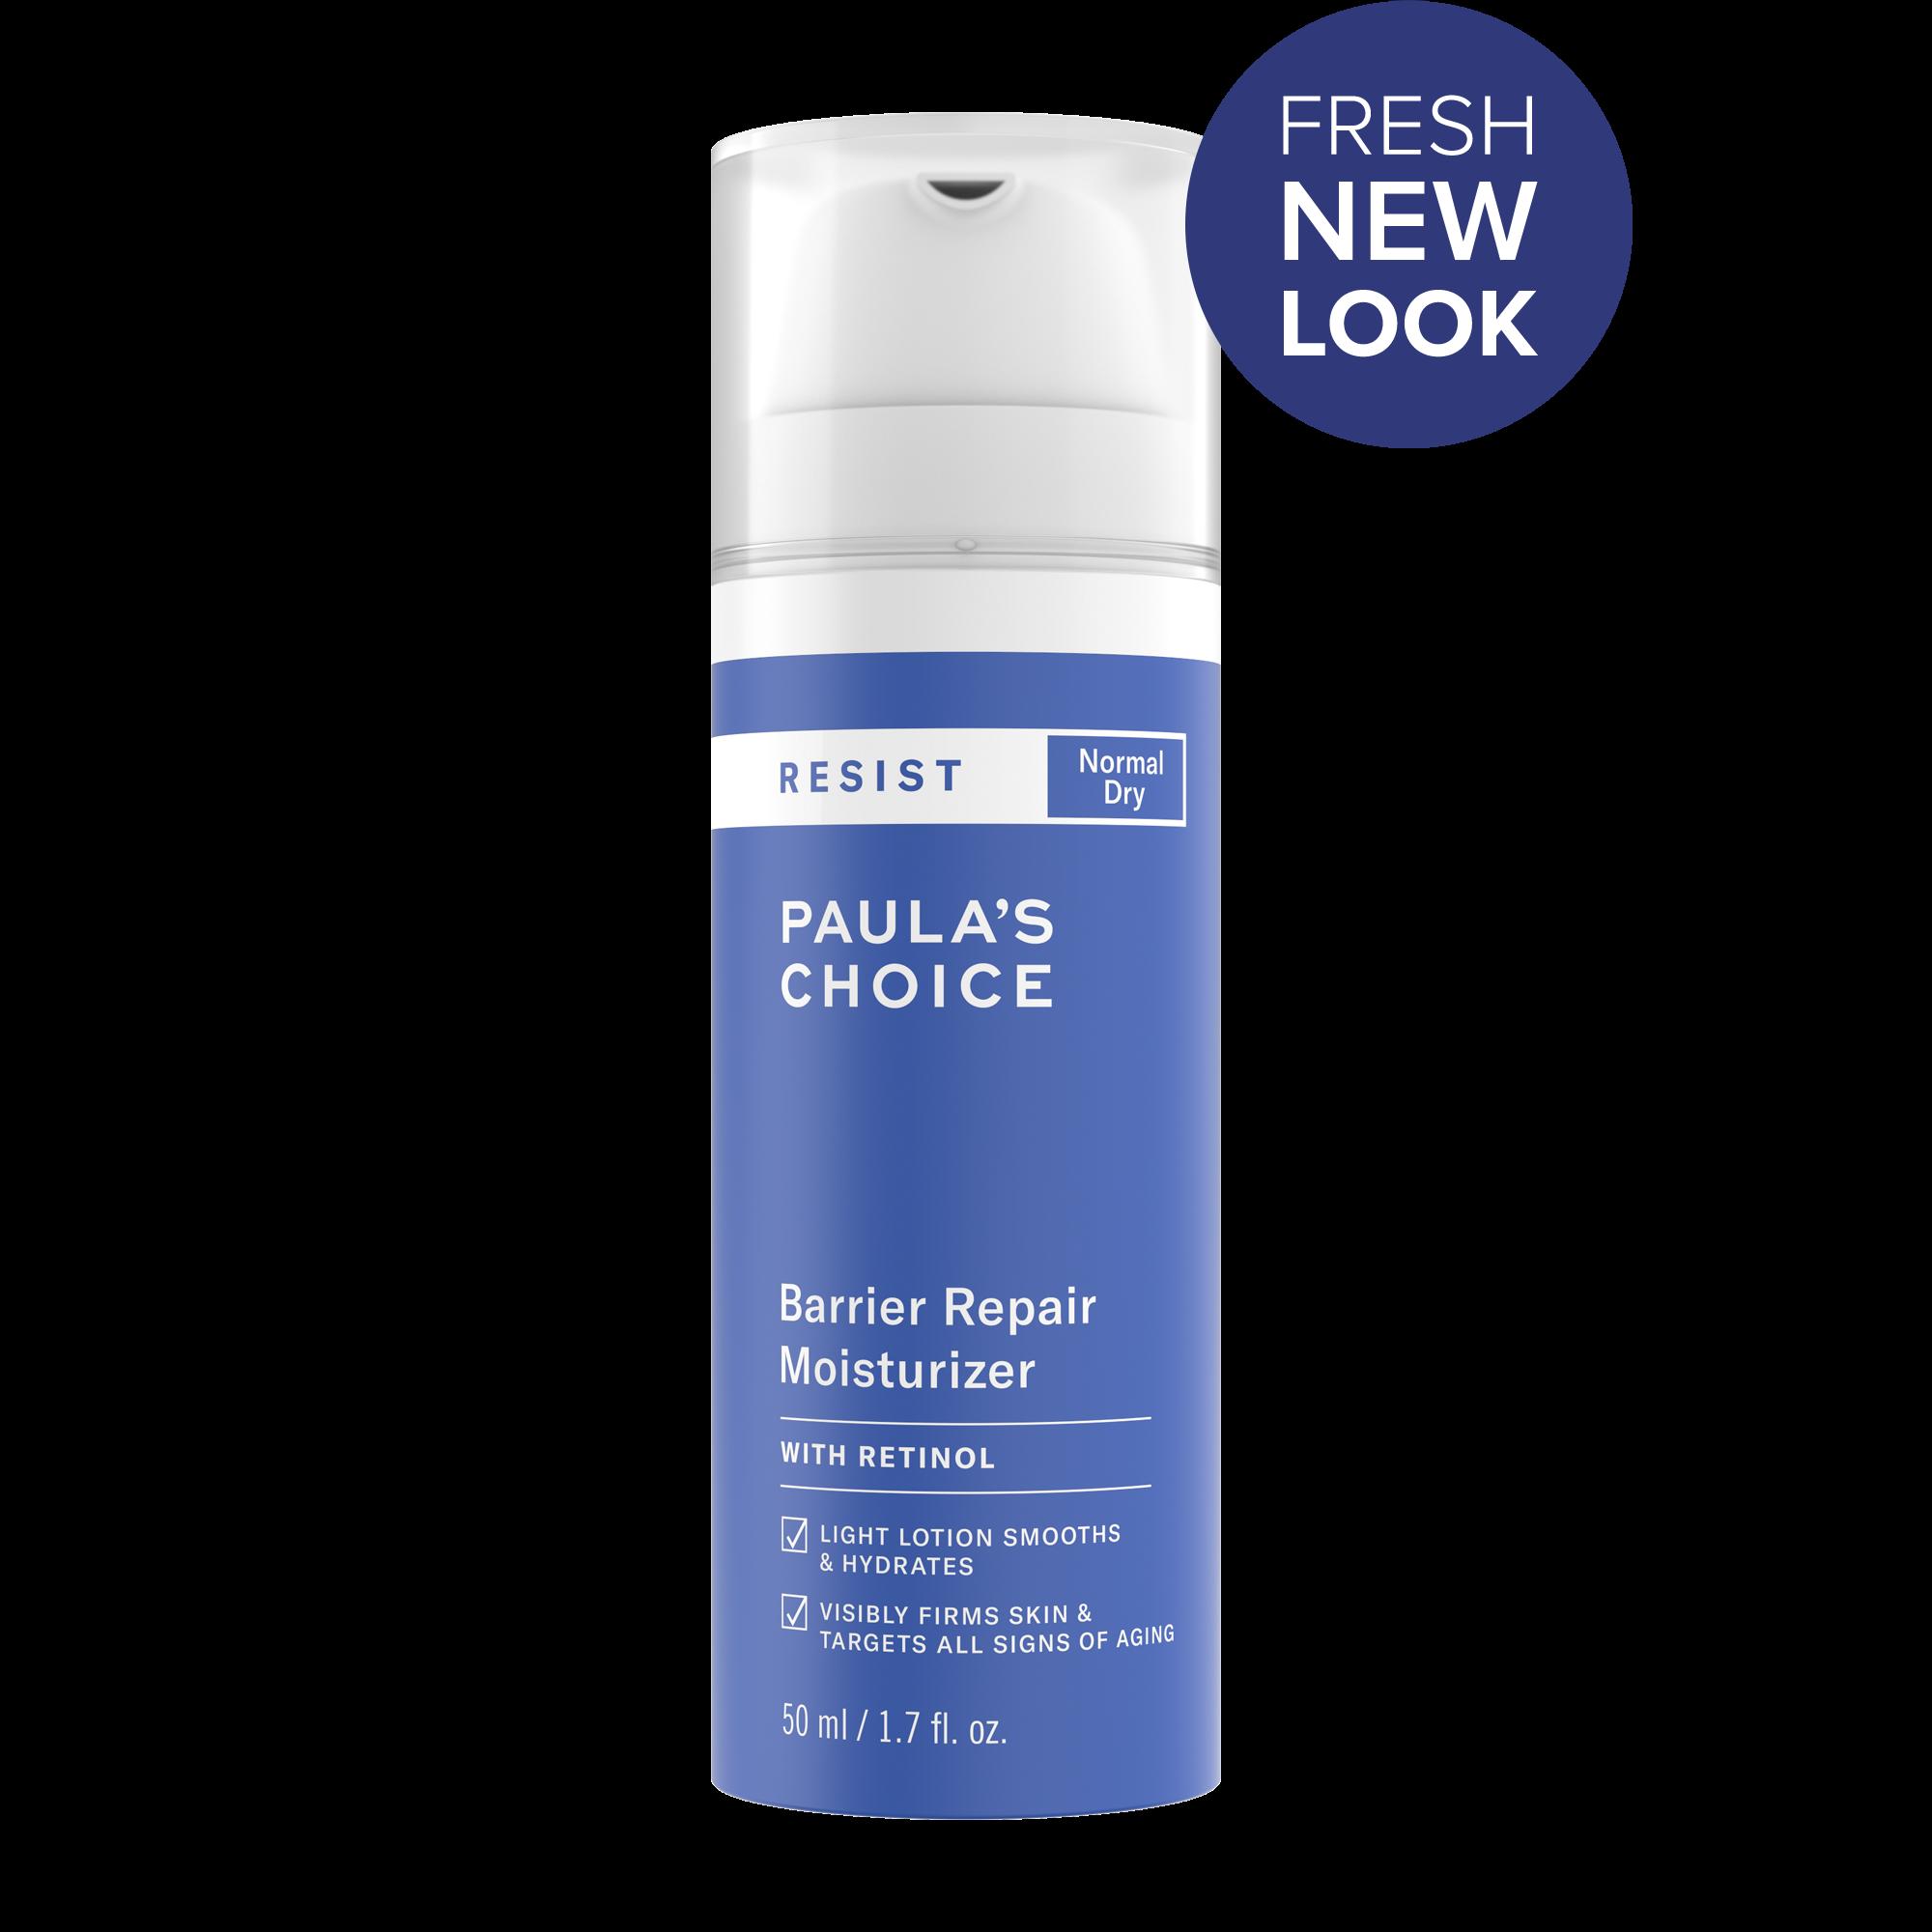 Kem dưỡng ẩm, chống lão hóa Paula's Choice Resist Barrier Repair Moisturizer Skin Remodeling 50ml